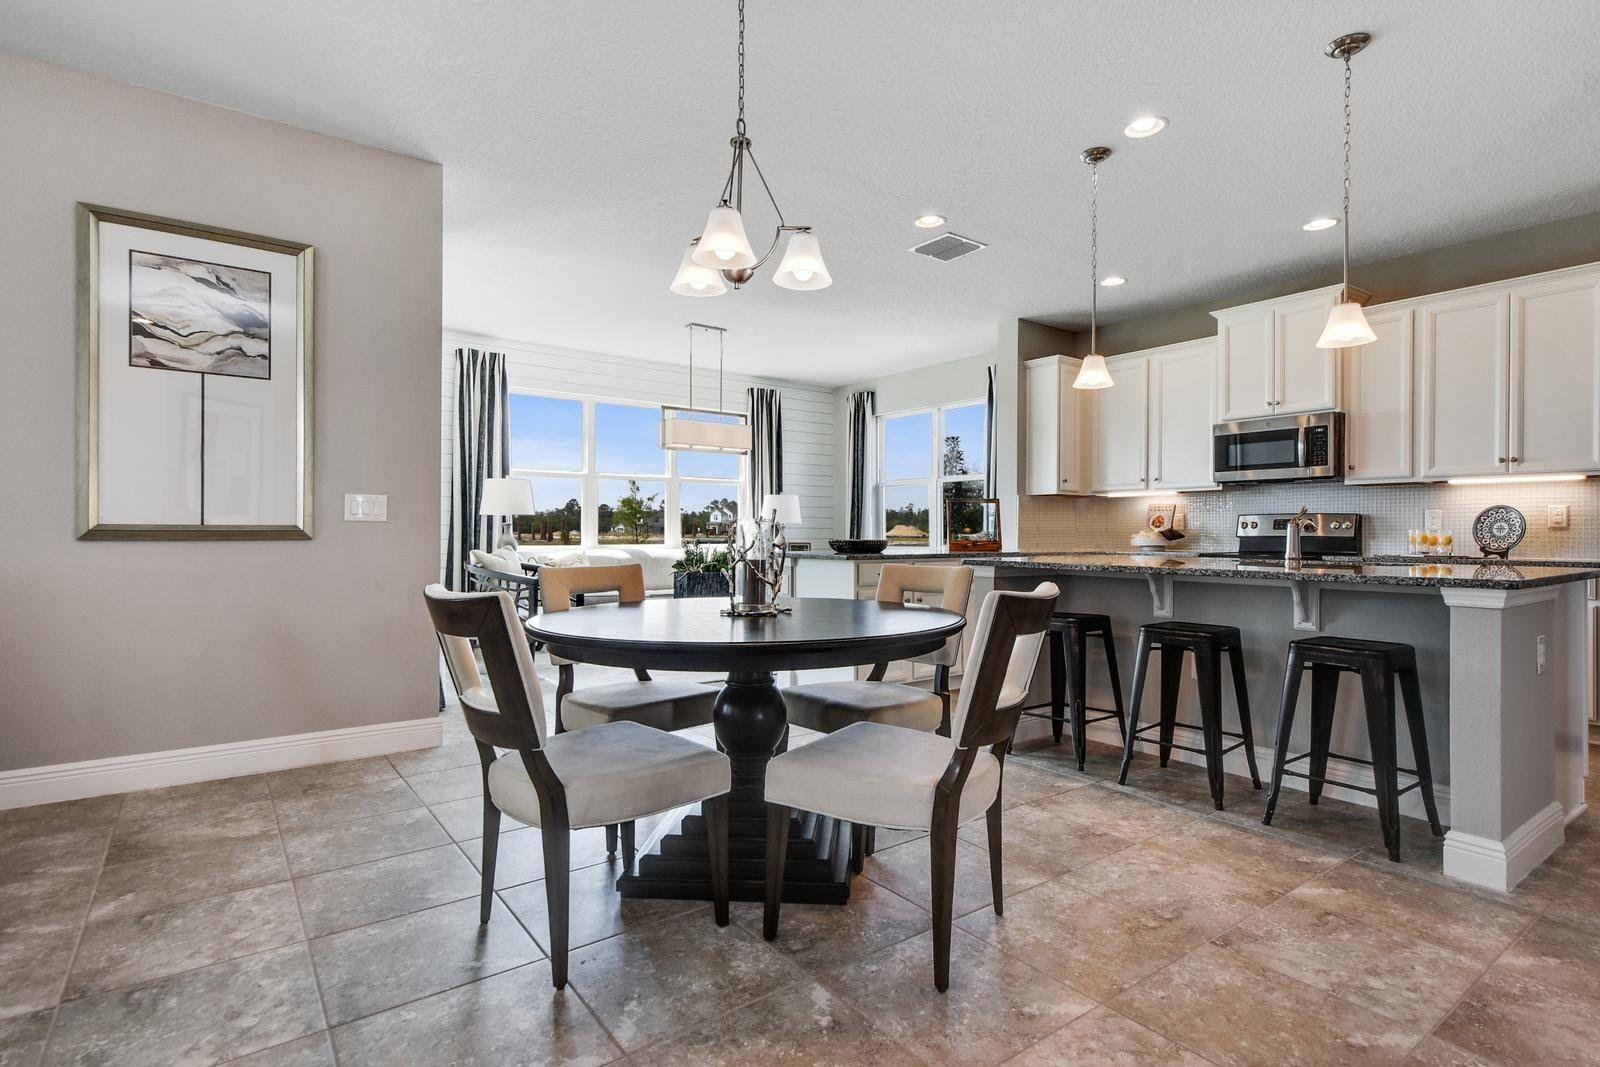 Breakfast-Room-in-Santa Rosa-at-Cypress Preserve Single Family Homes-in-Land O' Lakes